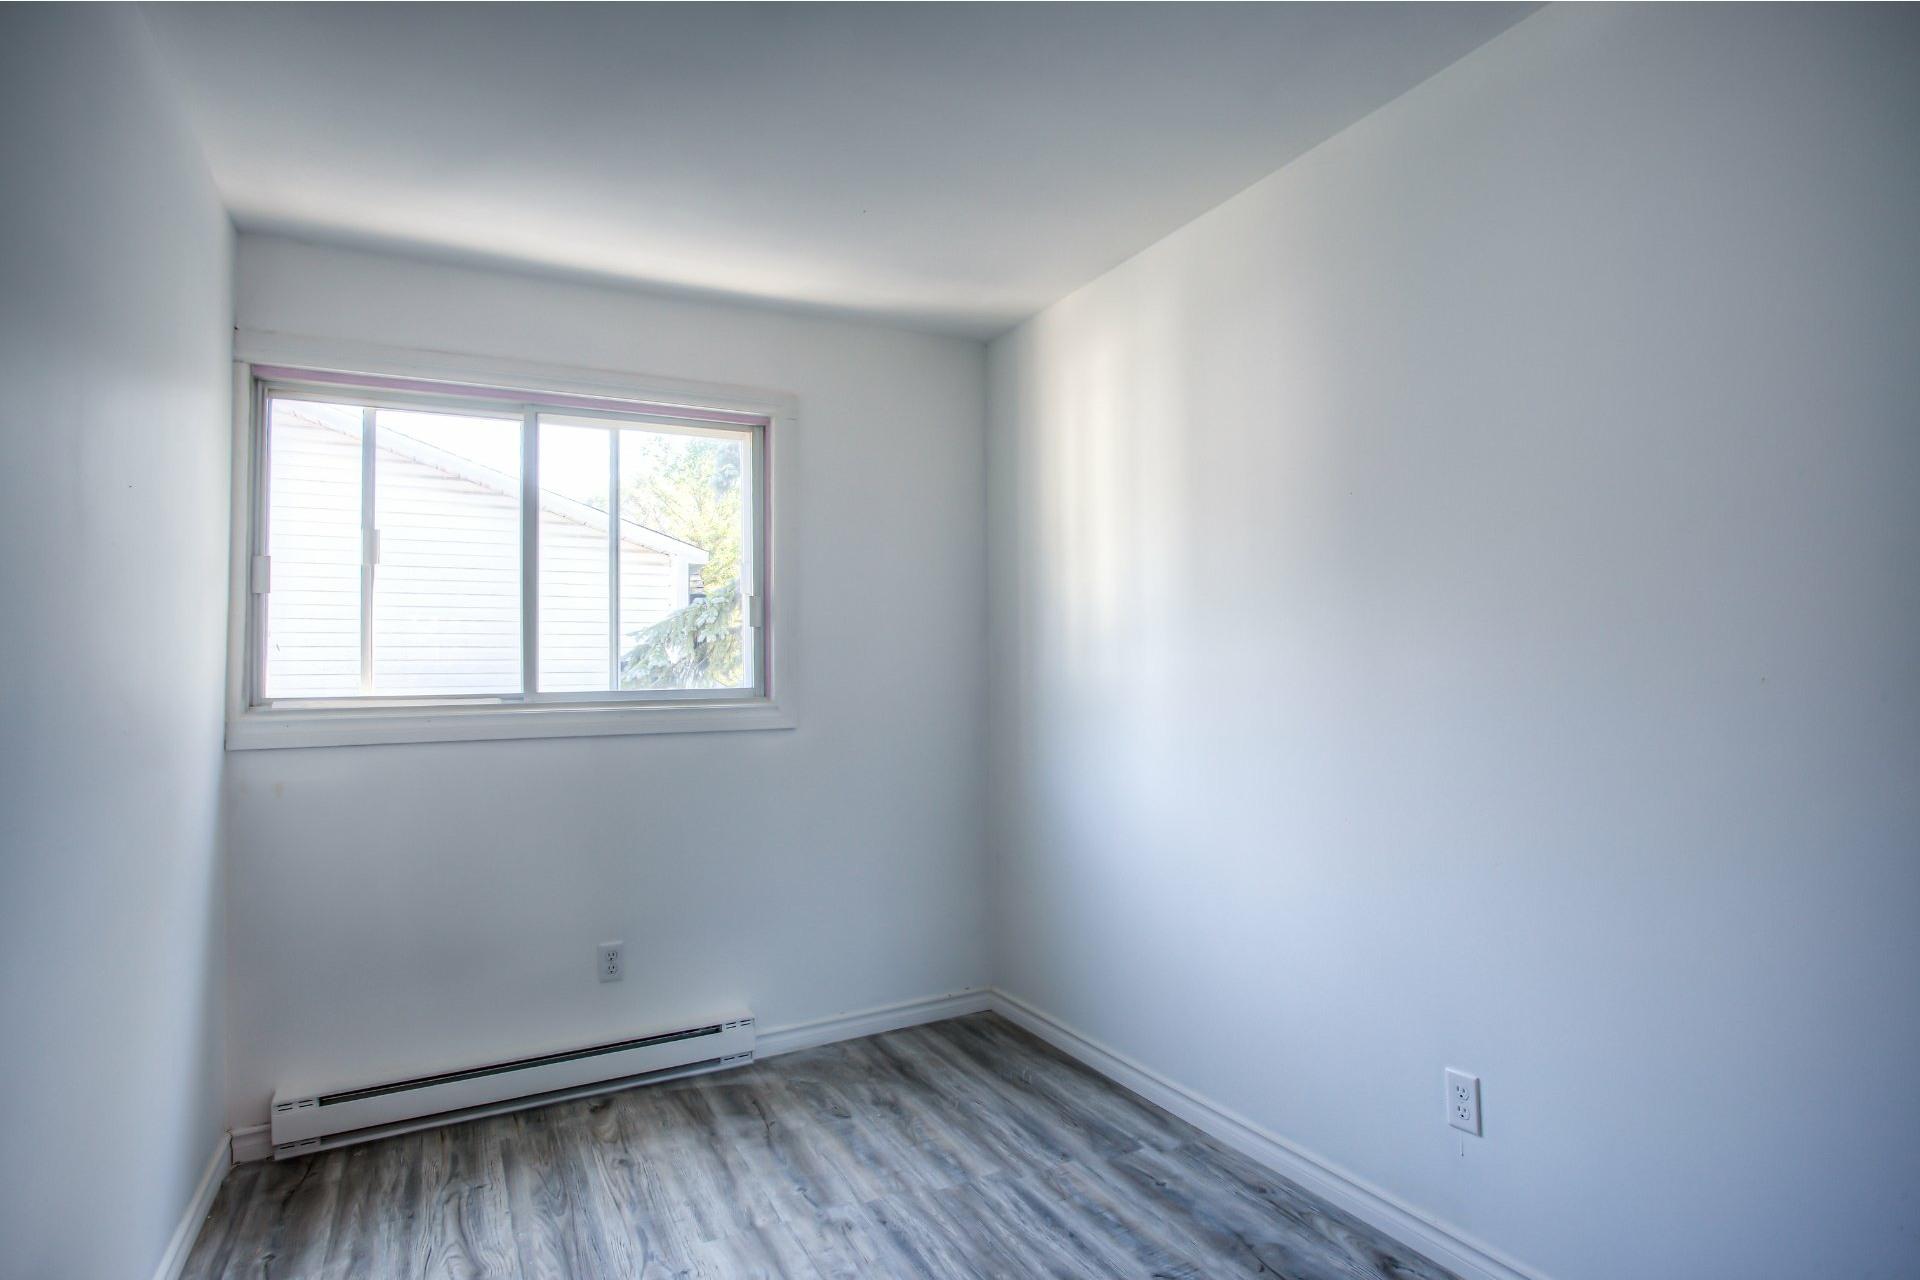 image 12 - MX - Casa sola - MX En venta Dollard-Des Ormeaux - 7 habitaciones